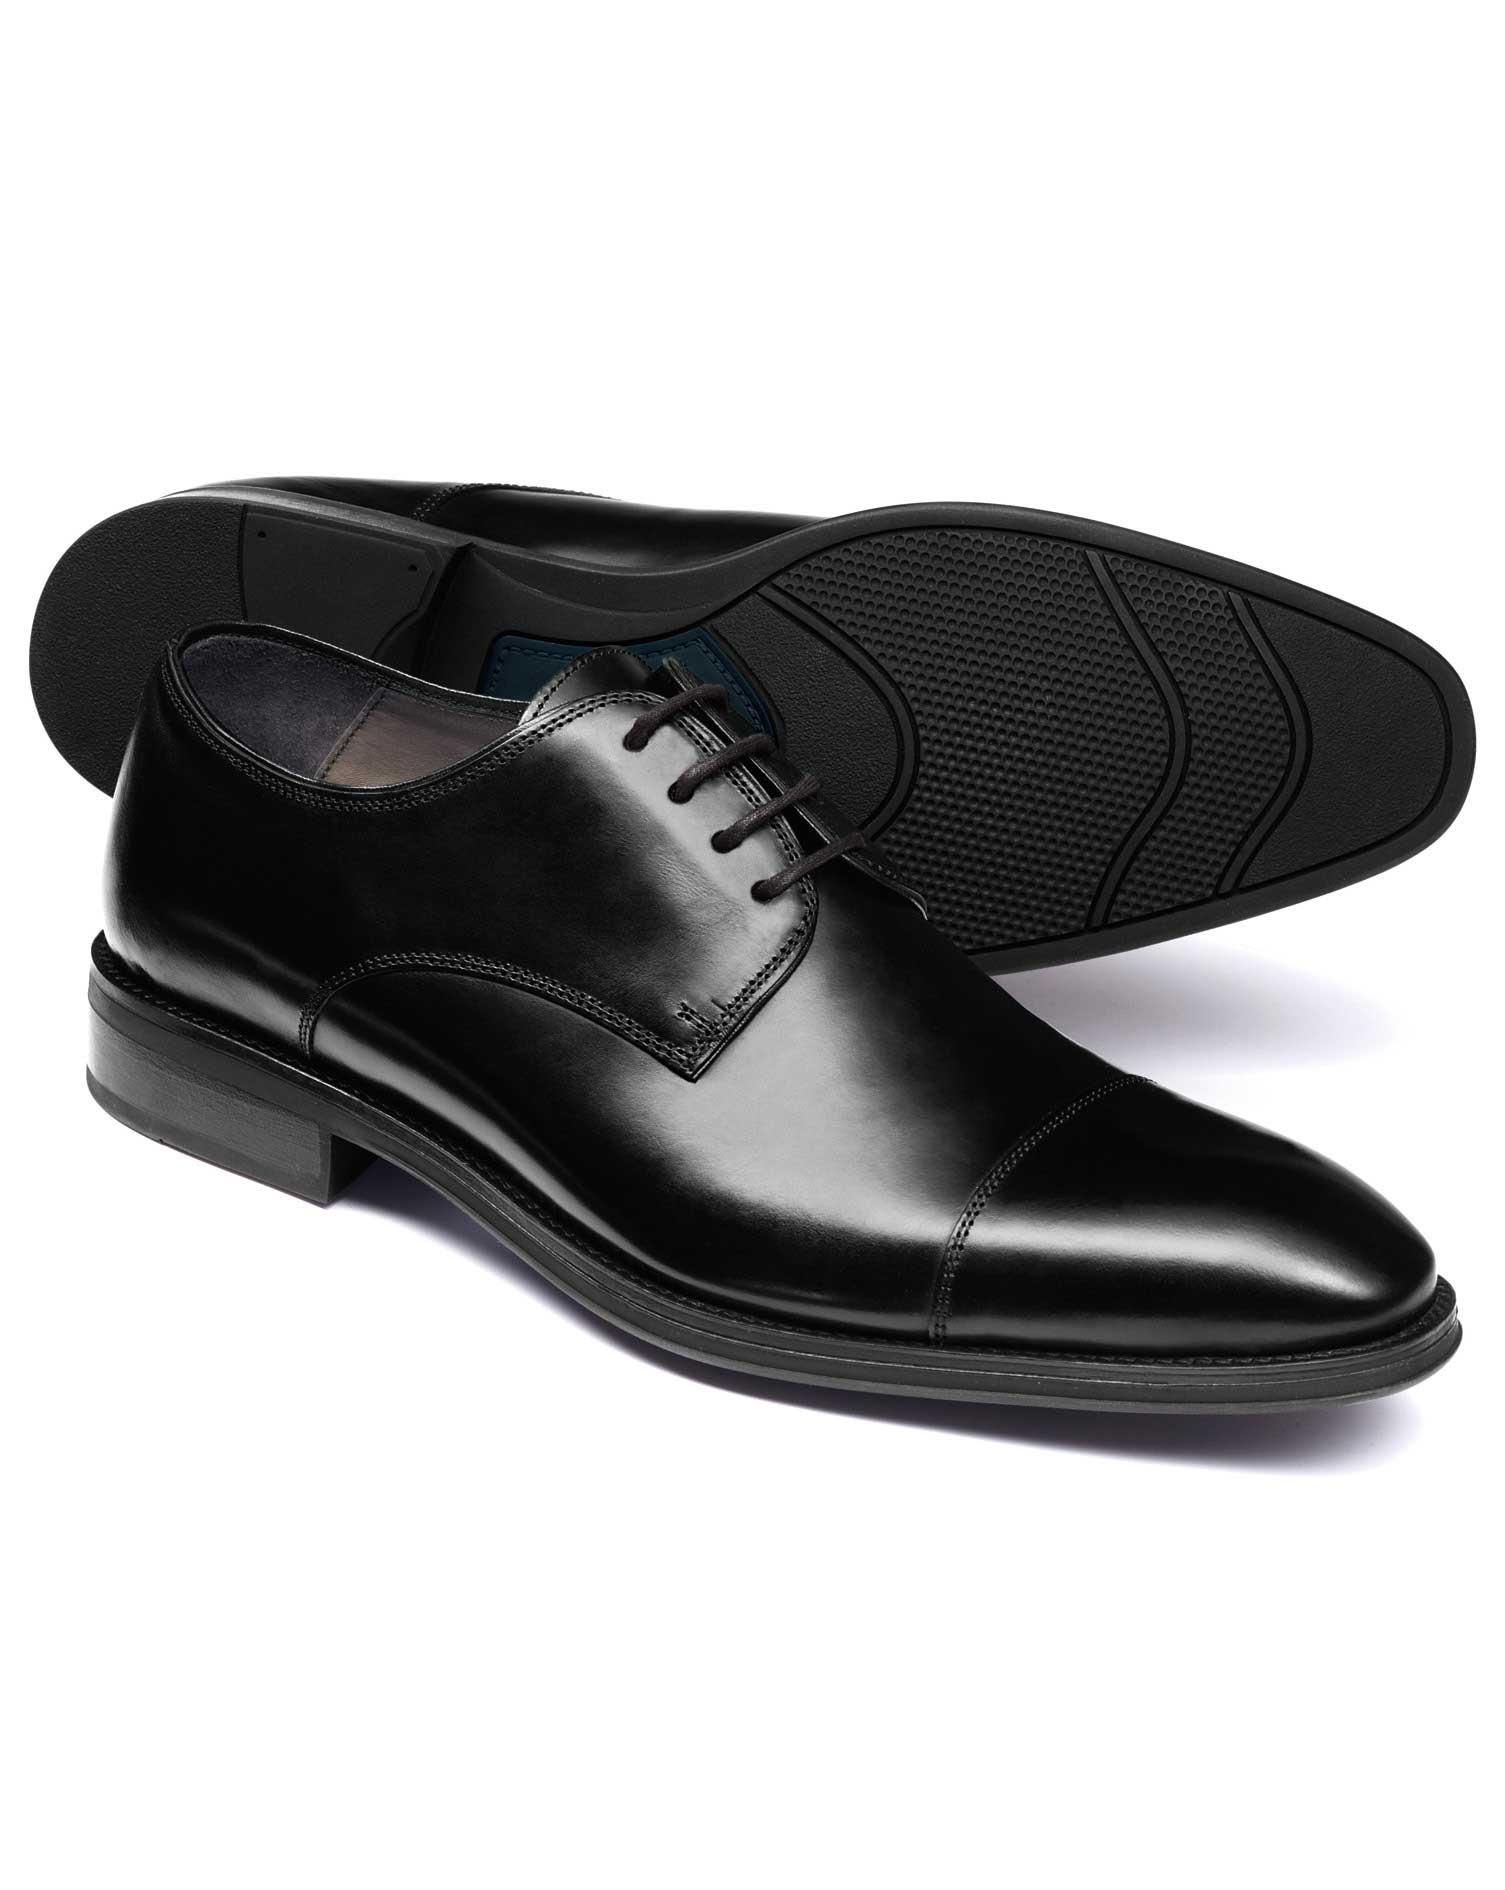 dress shoes.jpg